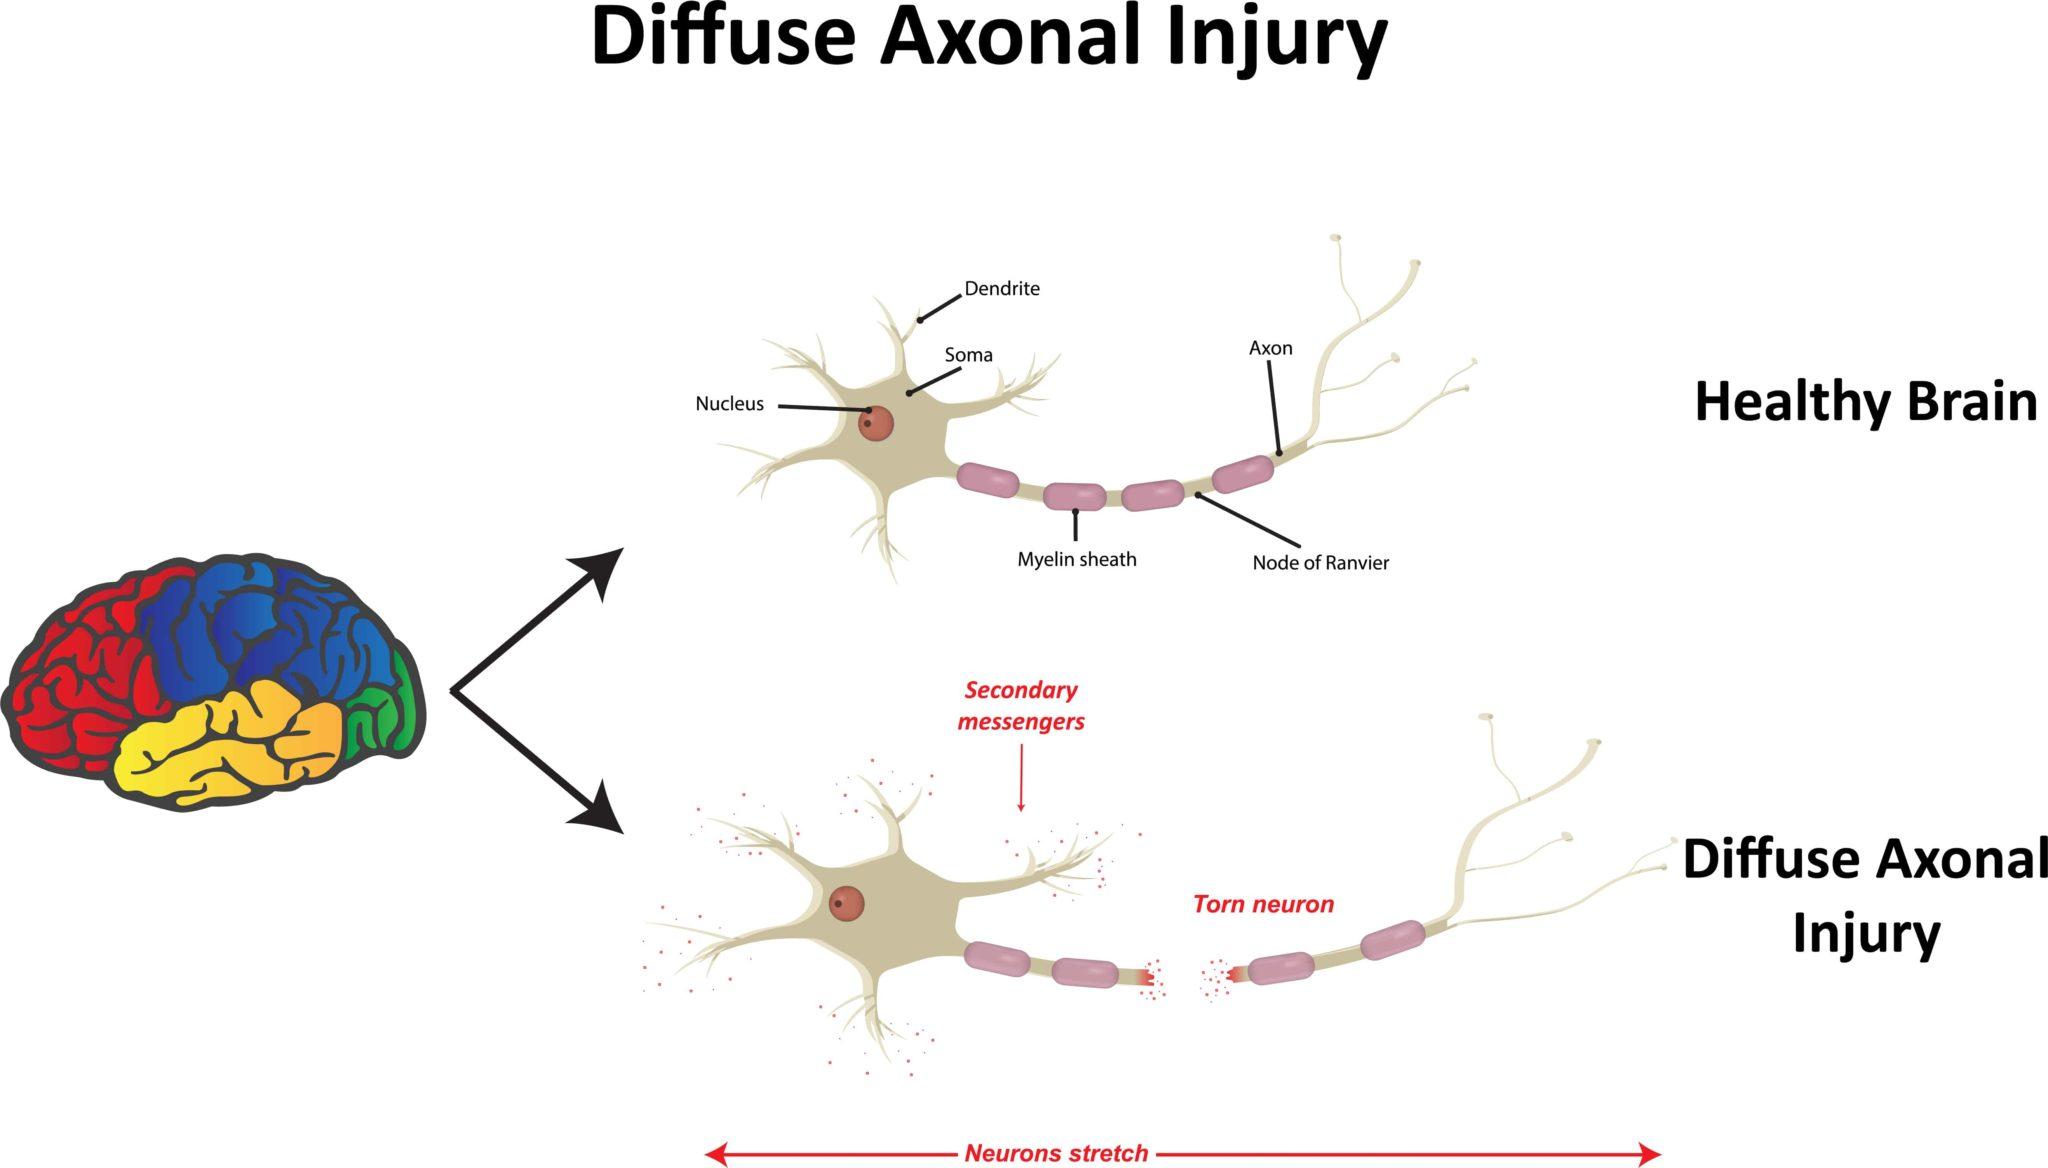 healthy-brain-vs-diffuse-axonal-brain-injury-propel ...